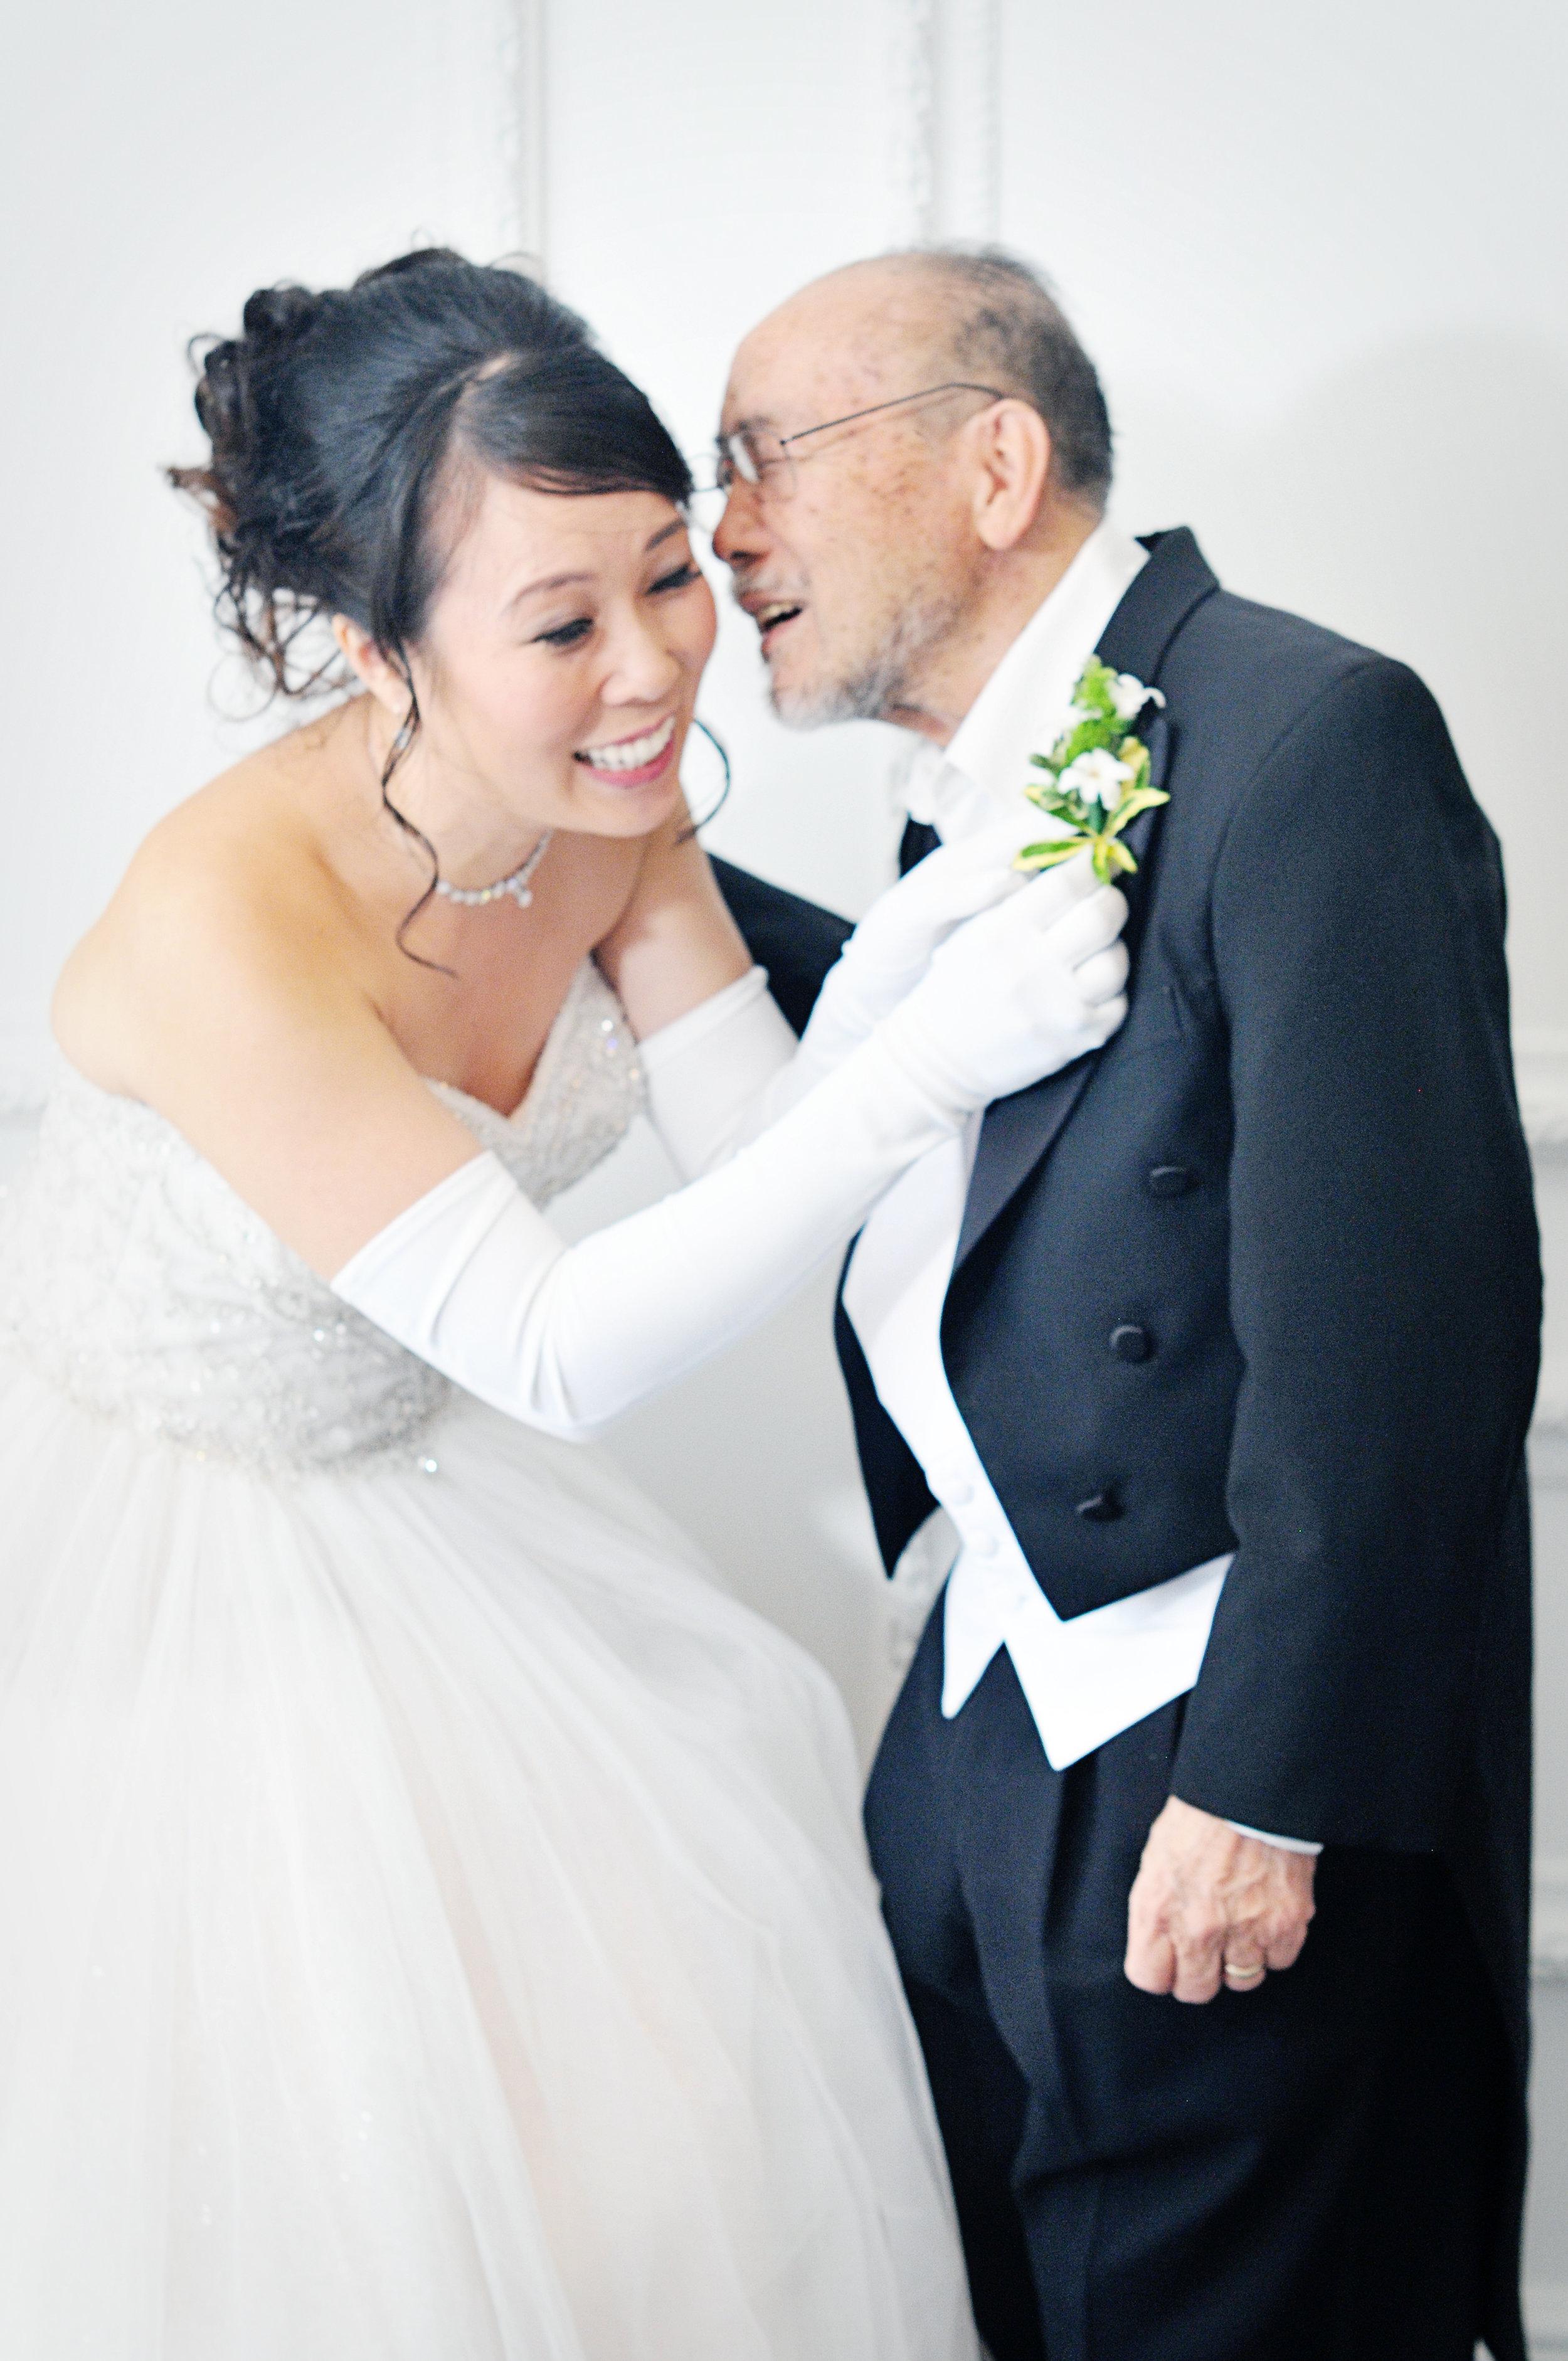 Partovi Wedding 2112 by maria pablo.jpg